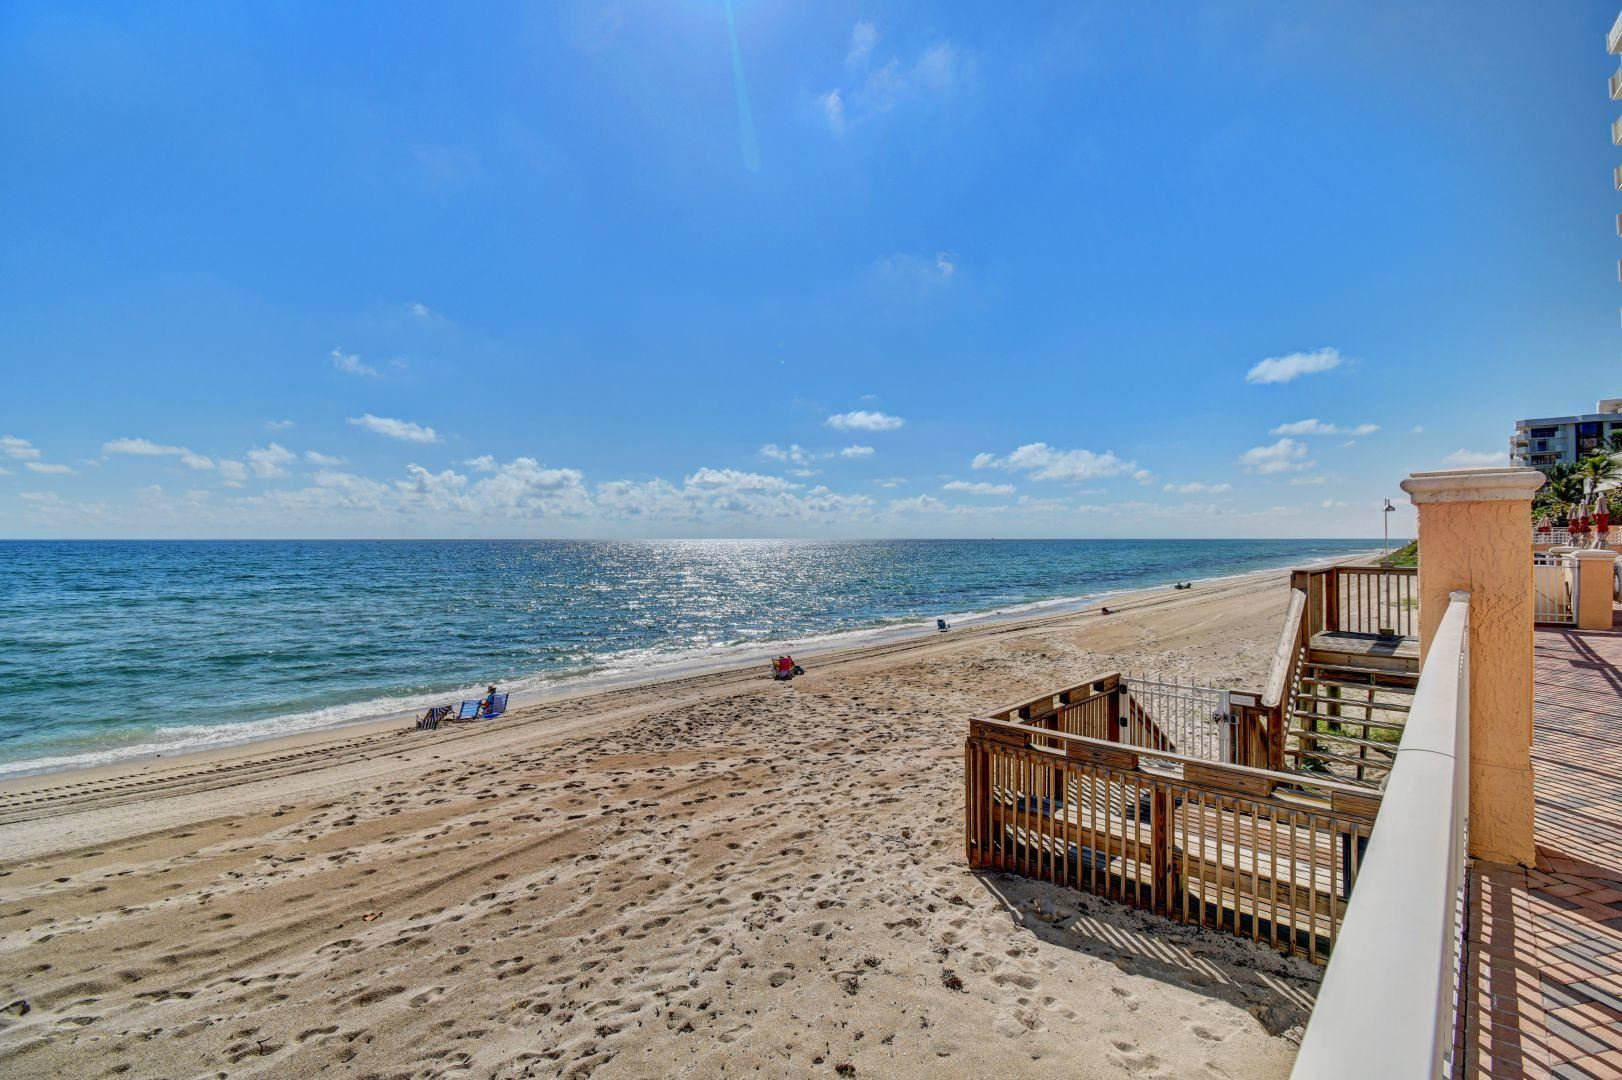 4505 S Ocean 302 Boulevard #302, Highland Beach, FL 33487 - MLS#: RX-10709751